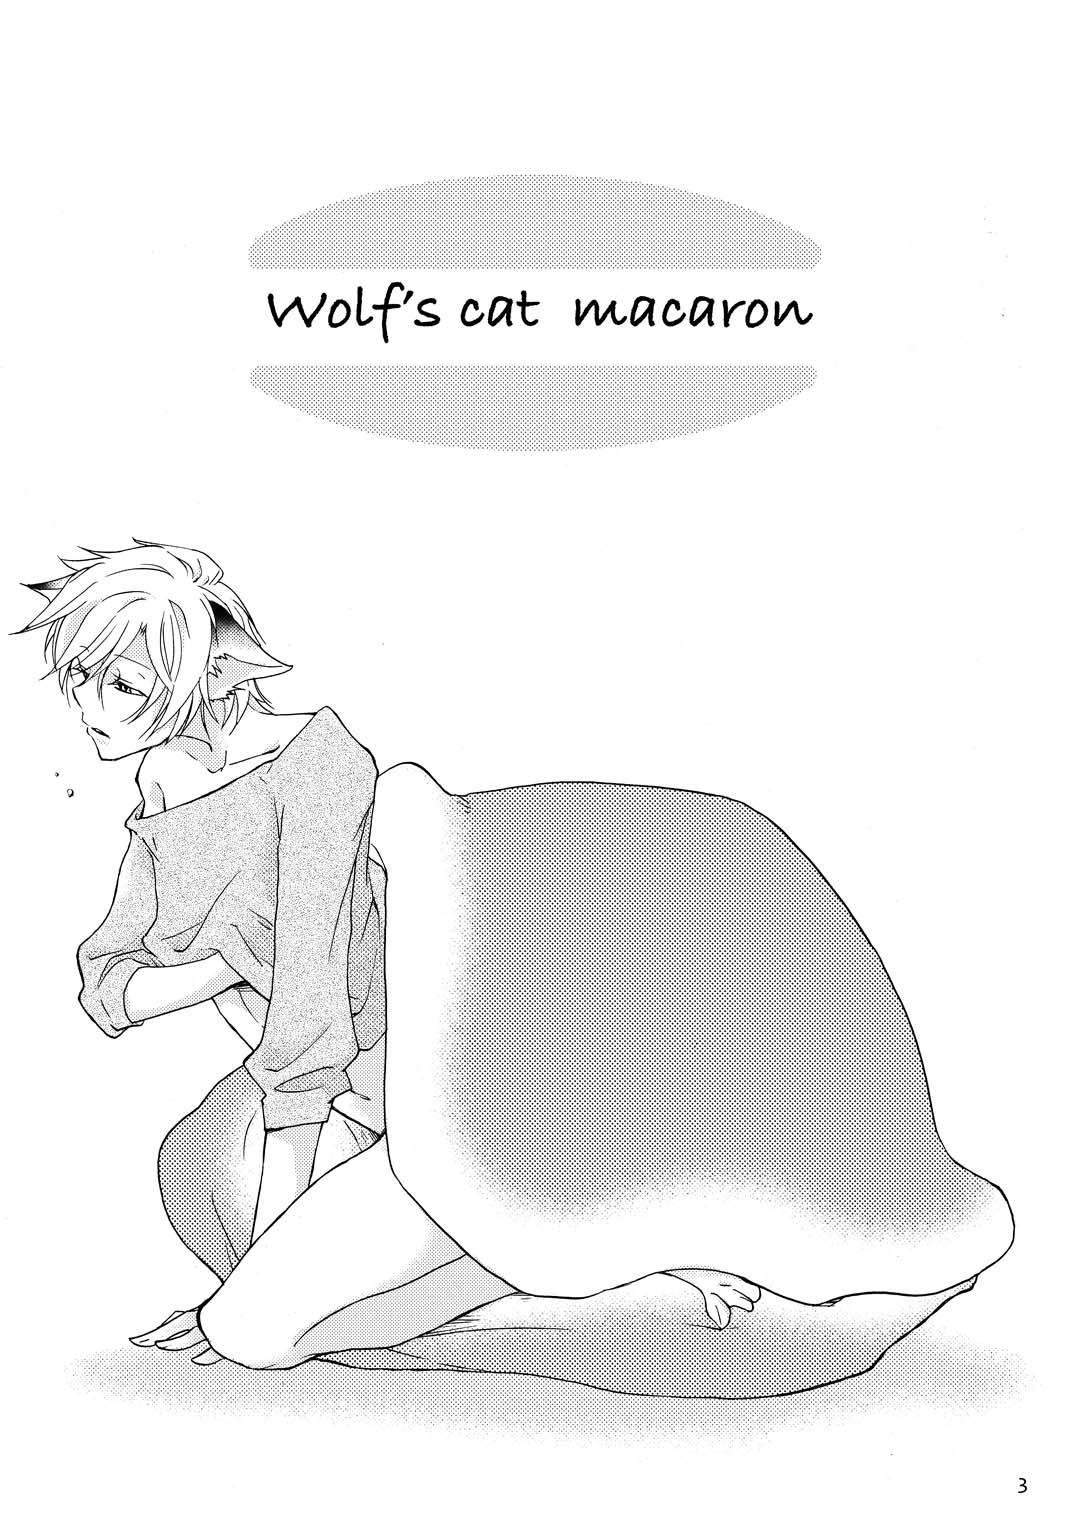 WOLF'S CAT Macaron: 1